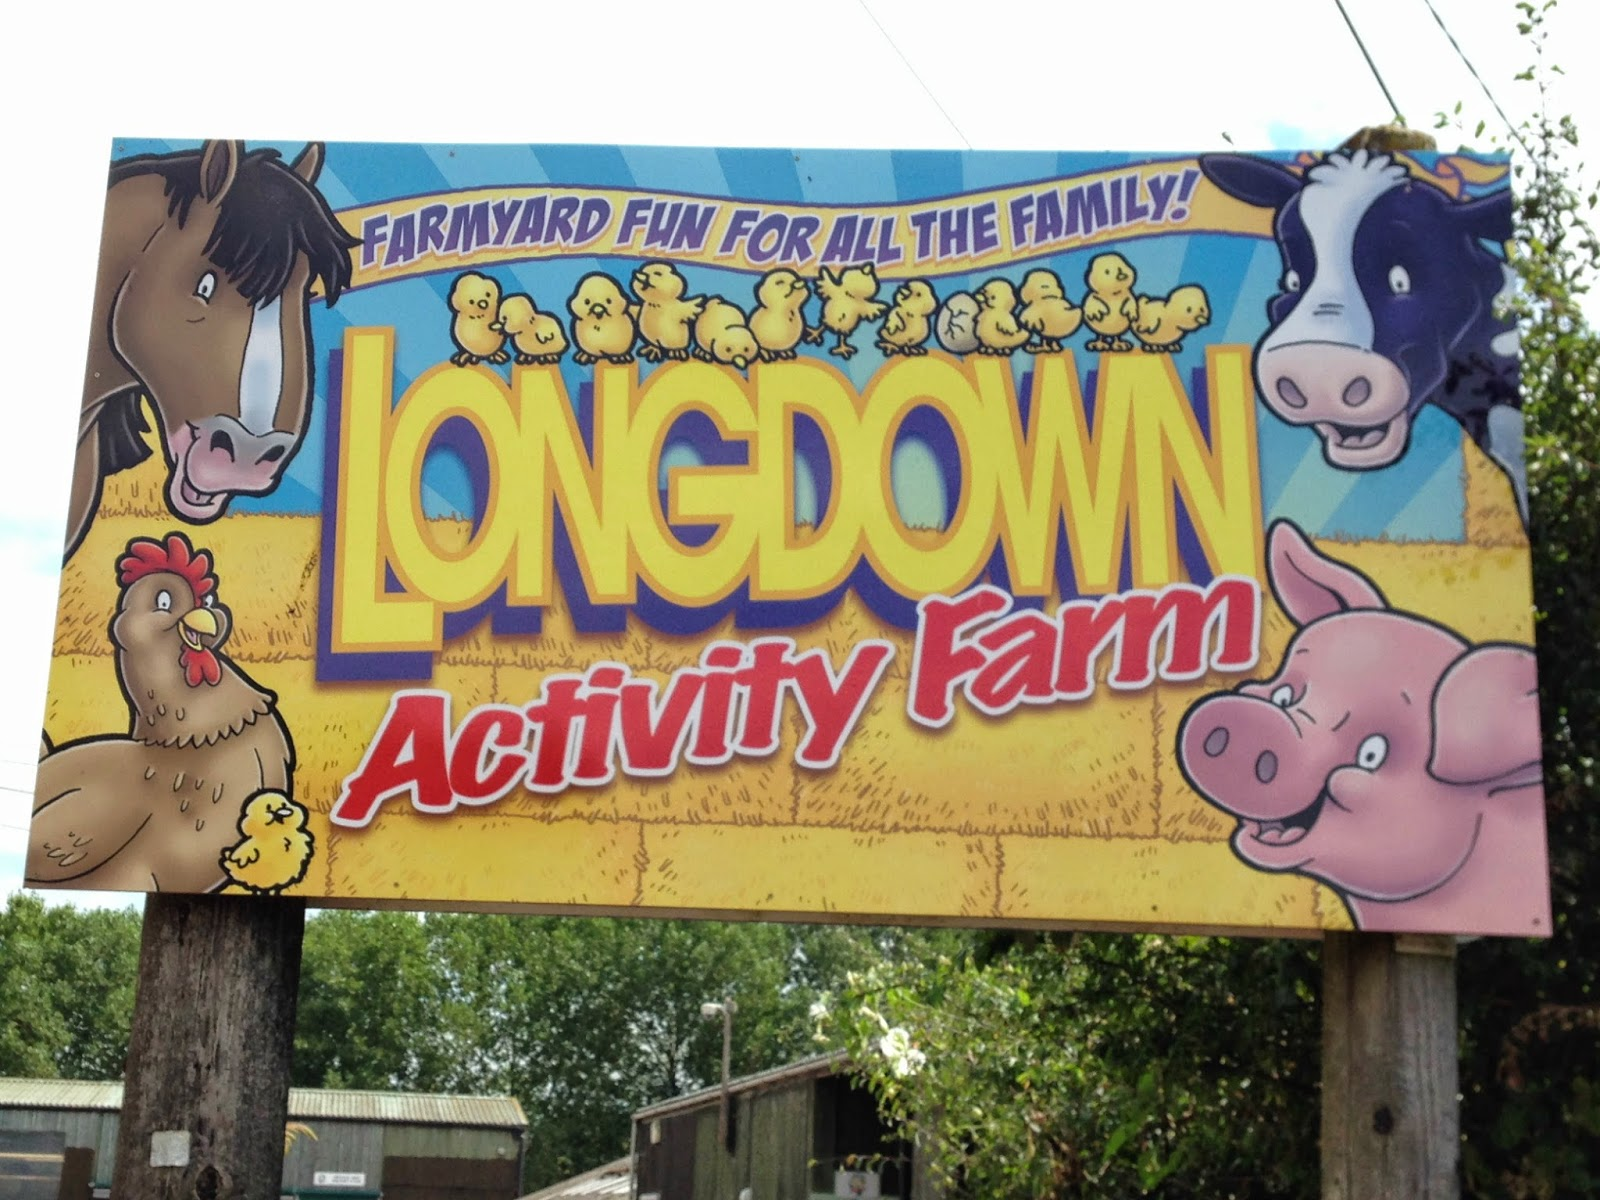 Longdown Activity Farm sign